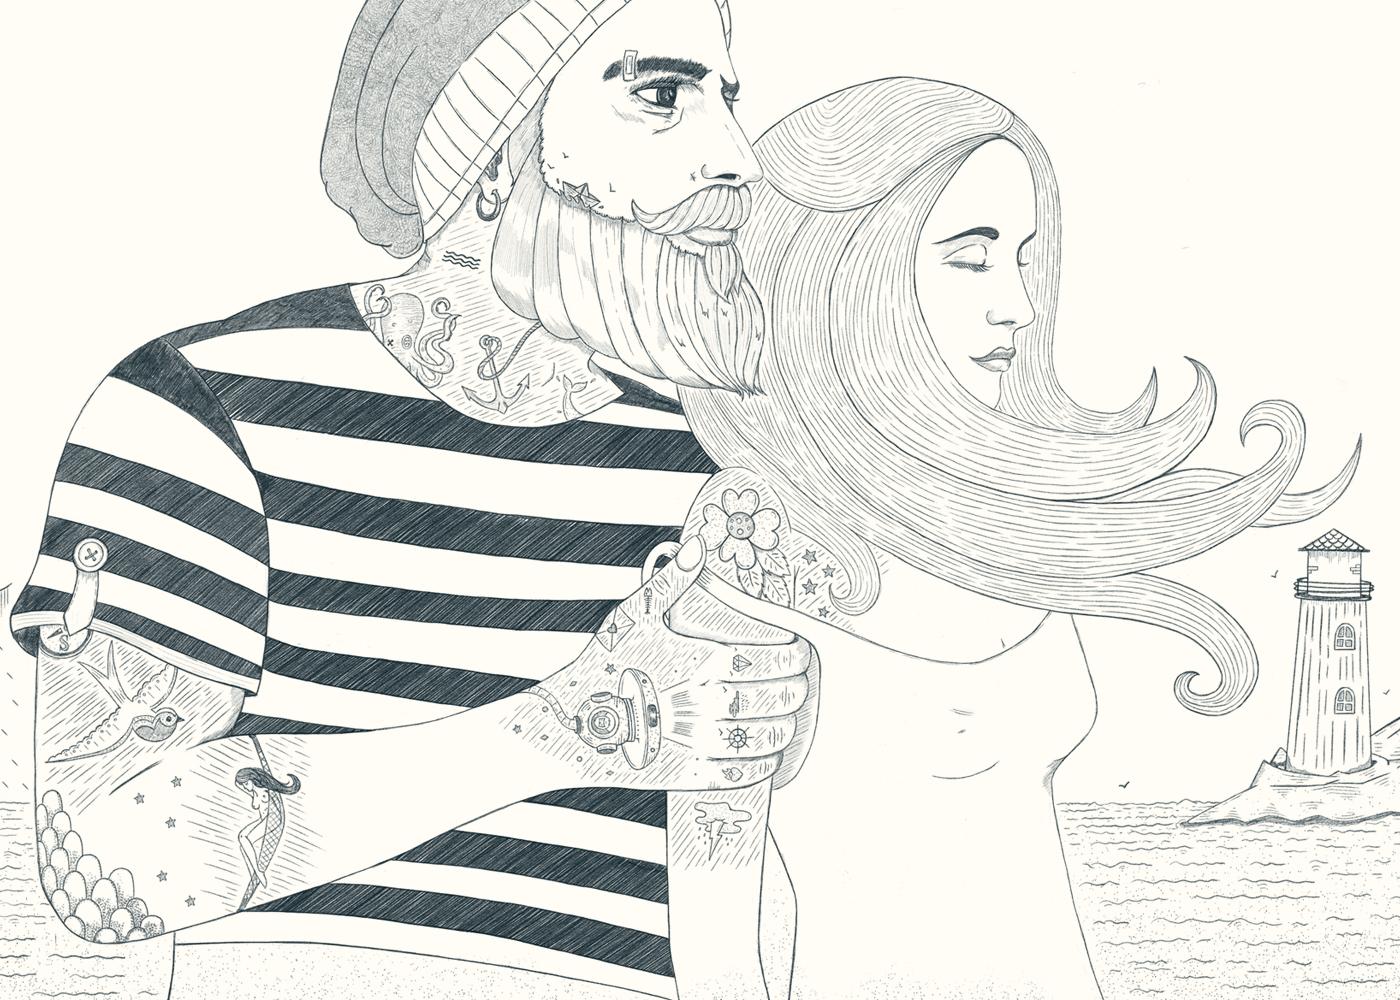 tatuadores espanoles srsleepless 00